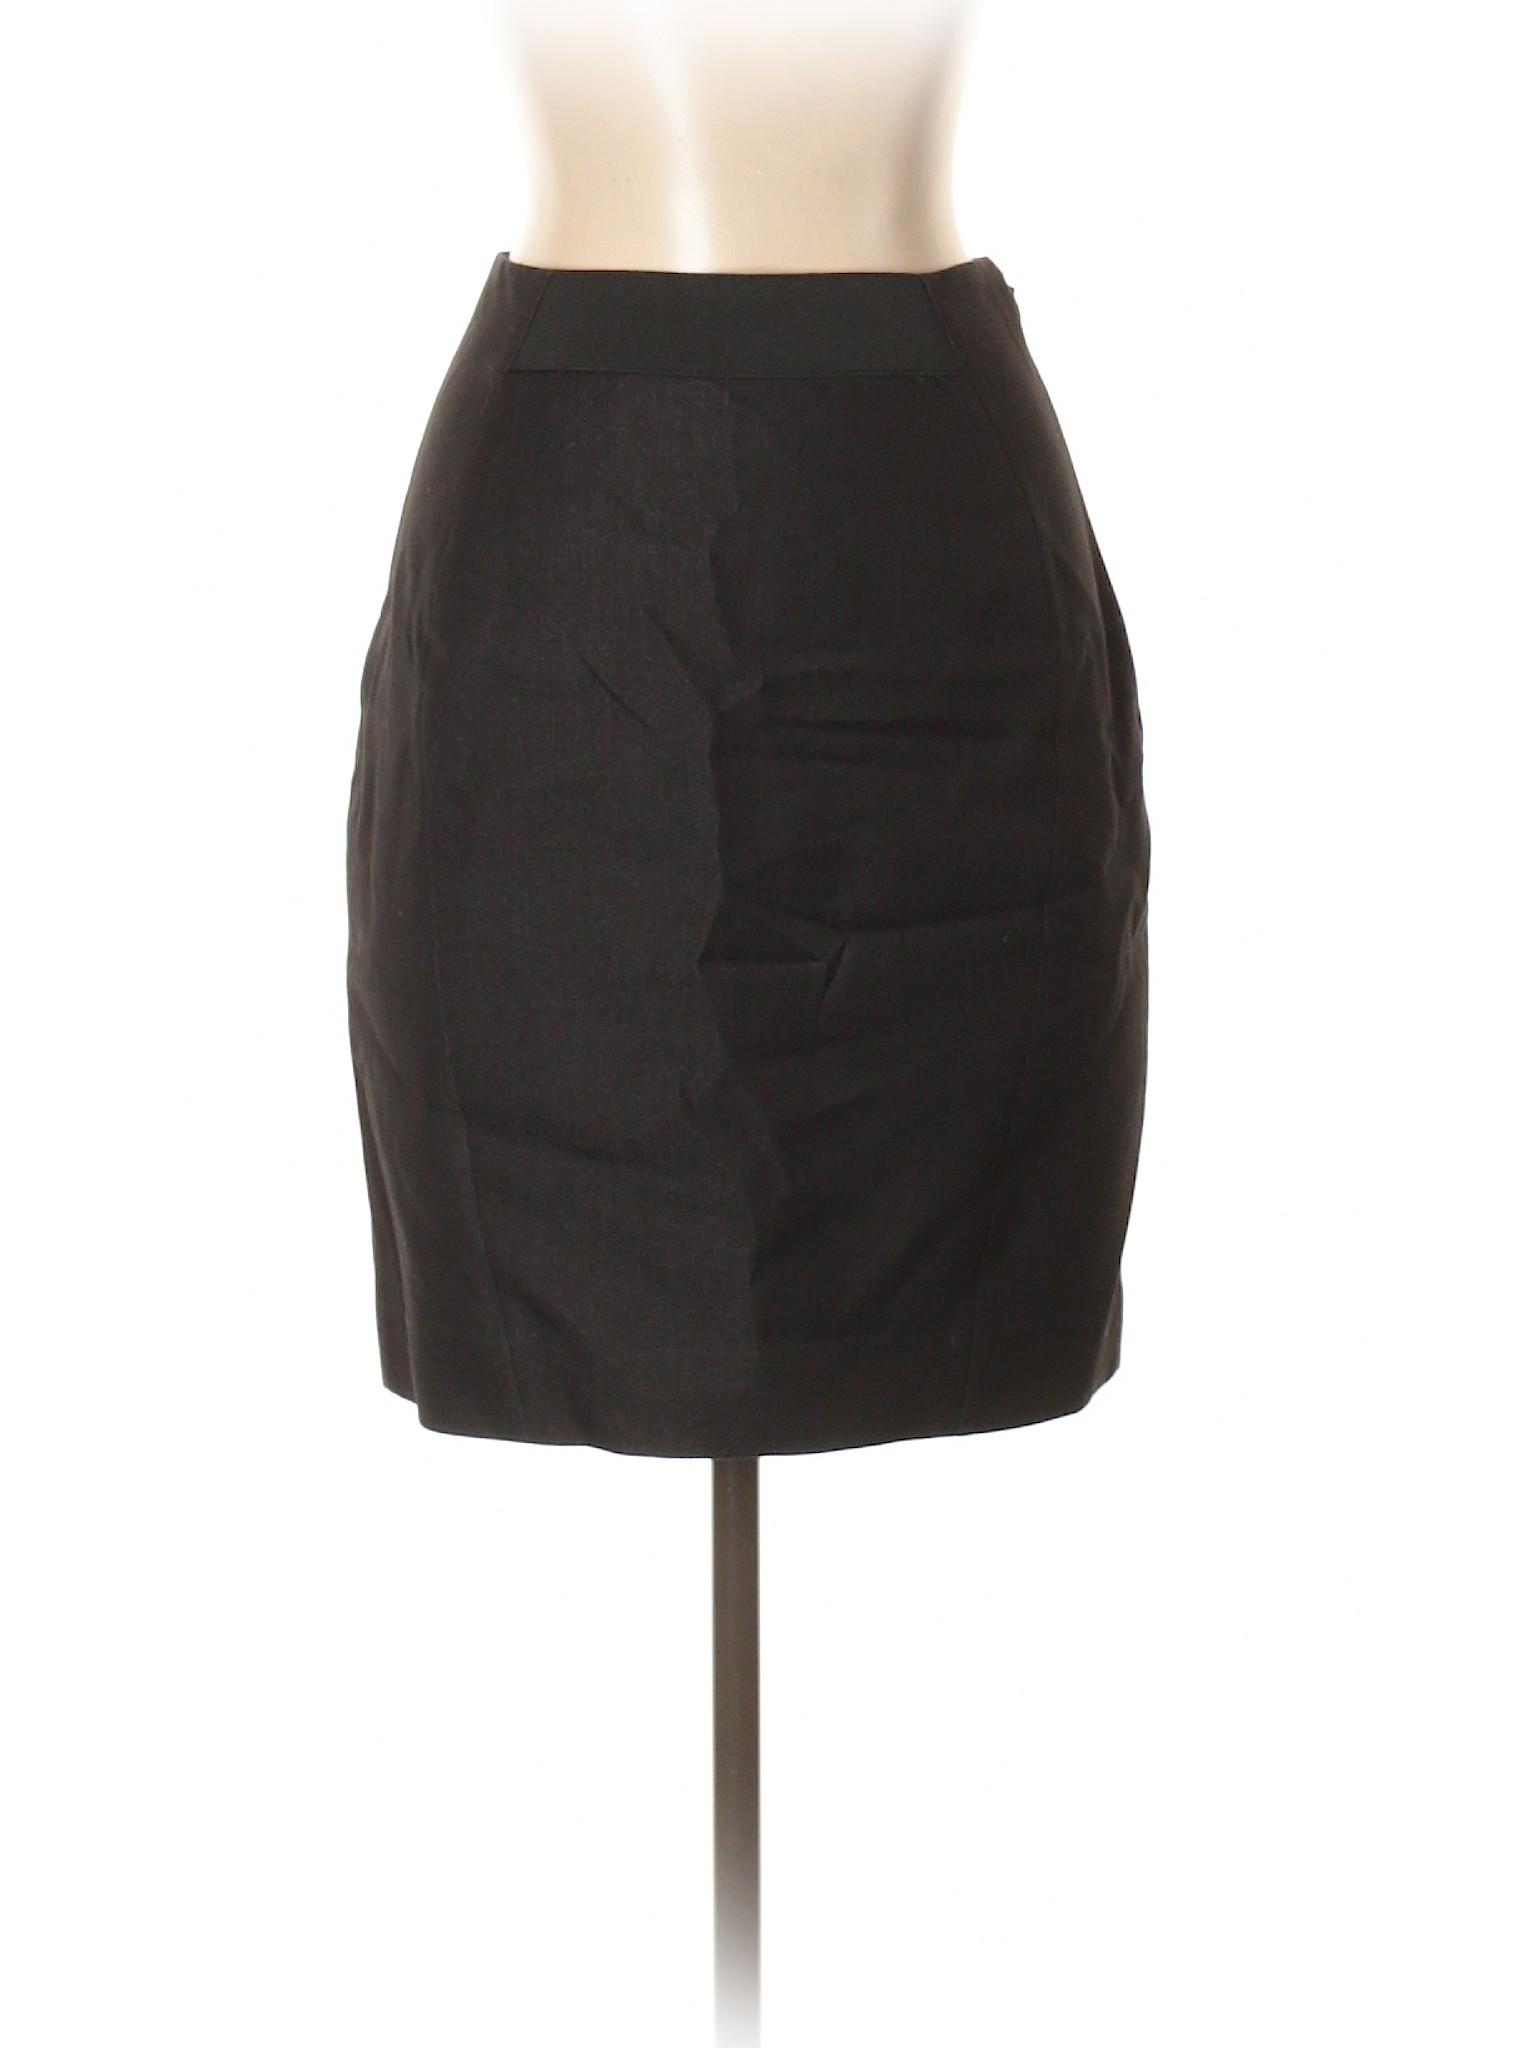 Skirt Boutique Casual Skirt Boutique Casual Boutique Boutique Casual Skirt Casual Skirt Boutique wO4UB4Waq